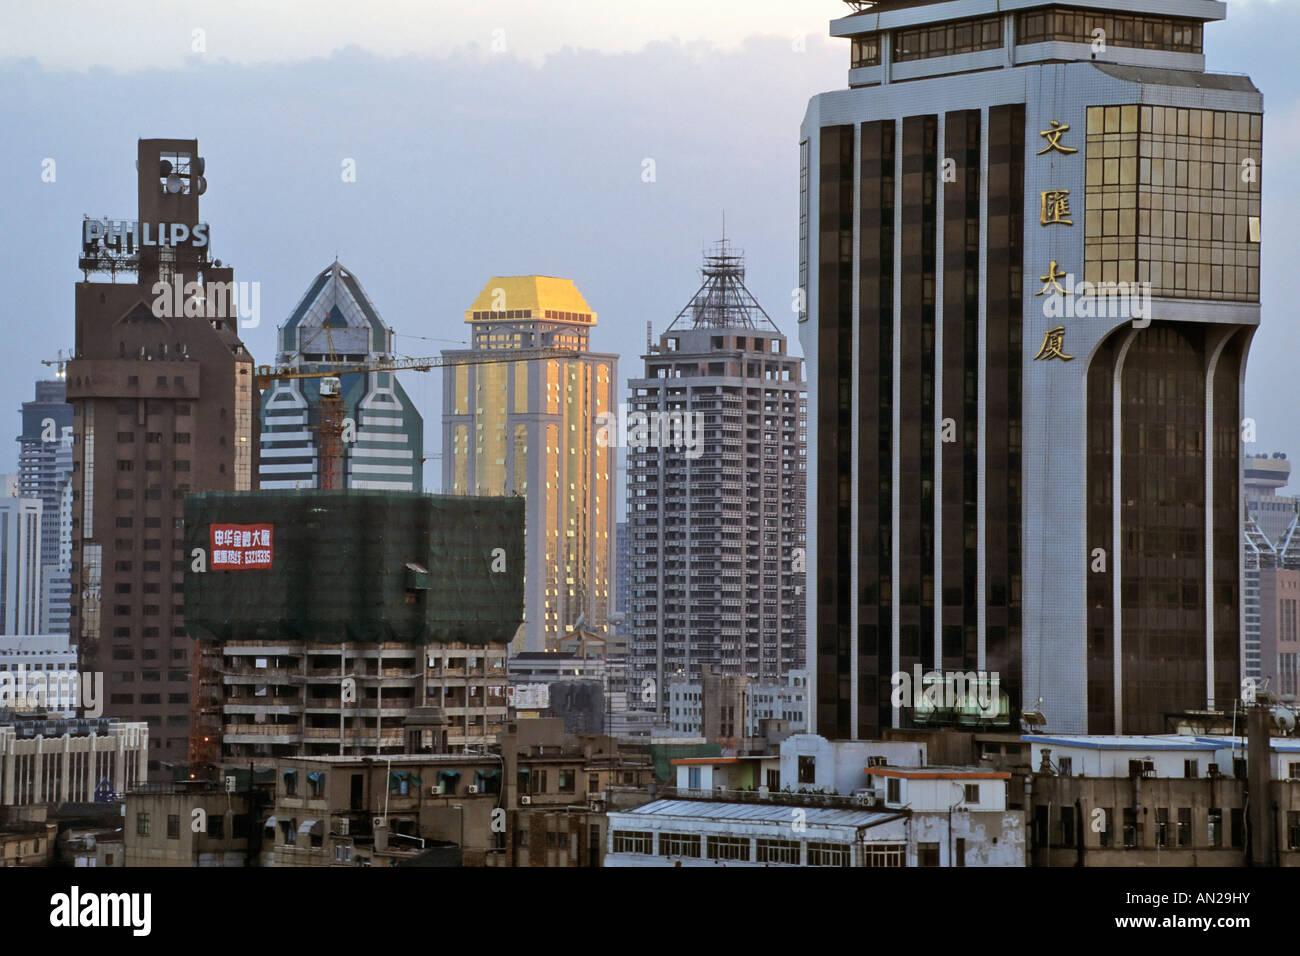 Shanghai Zentrum am Huangpu River downtown waterfront China skyline Stock Photo